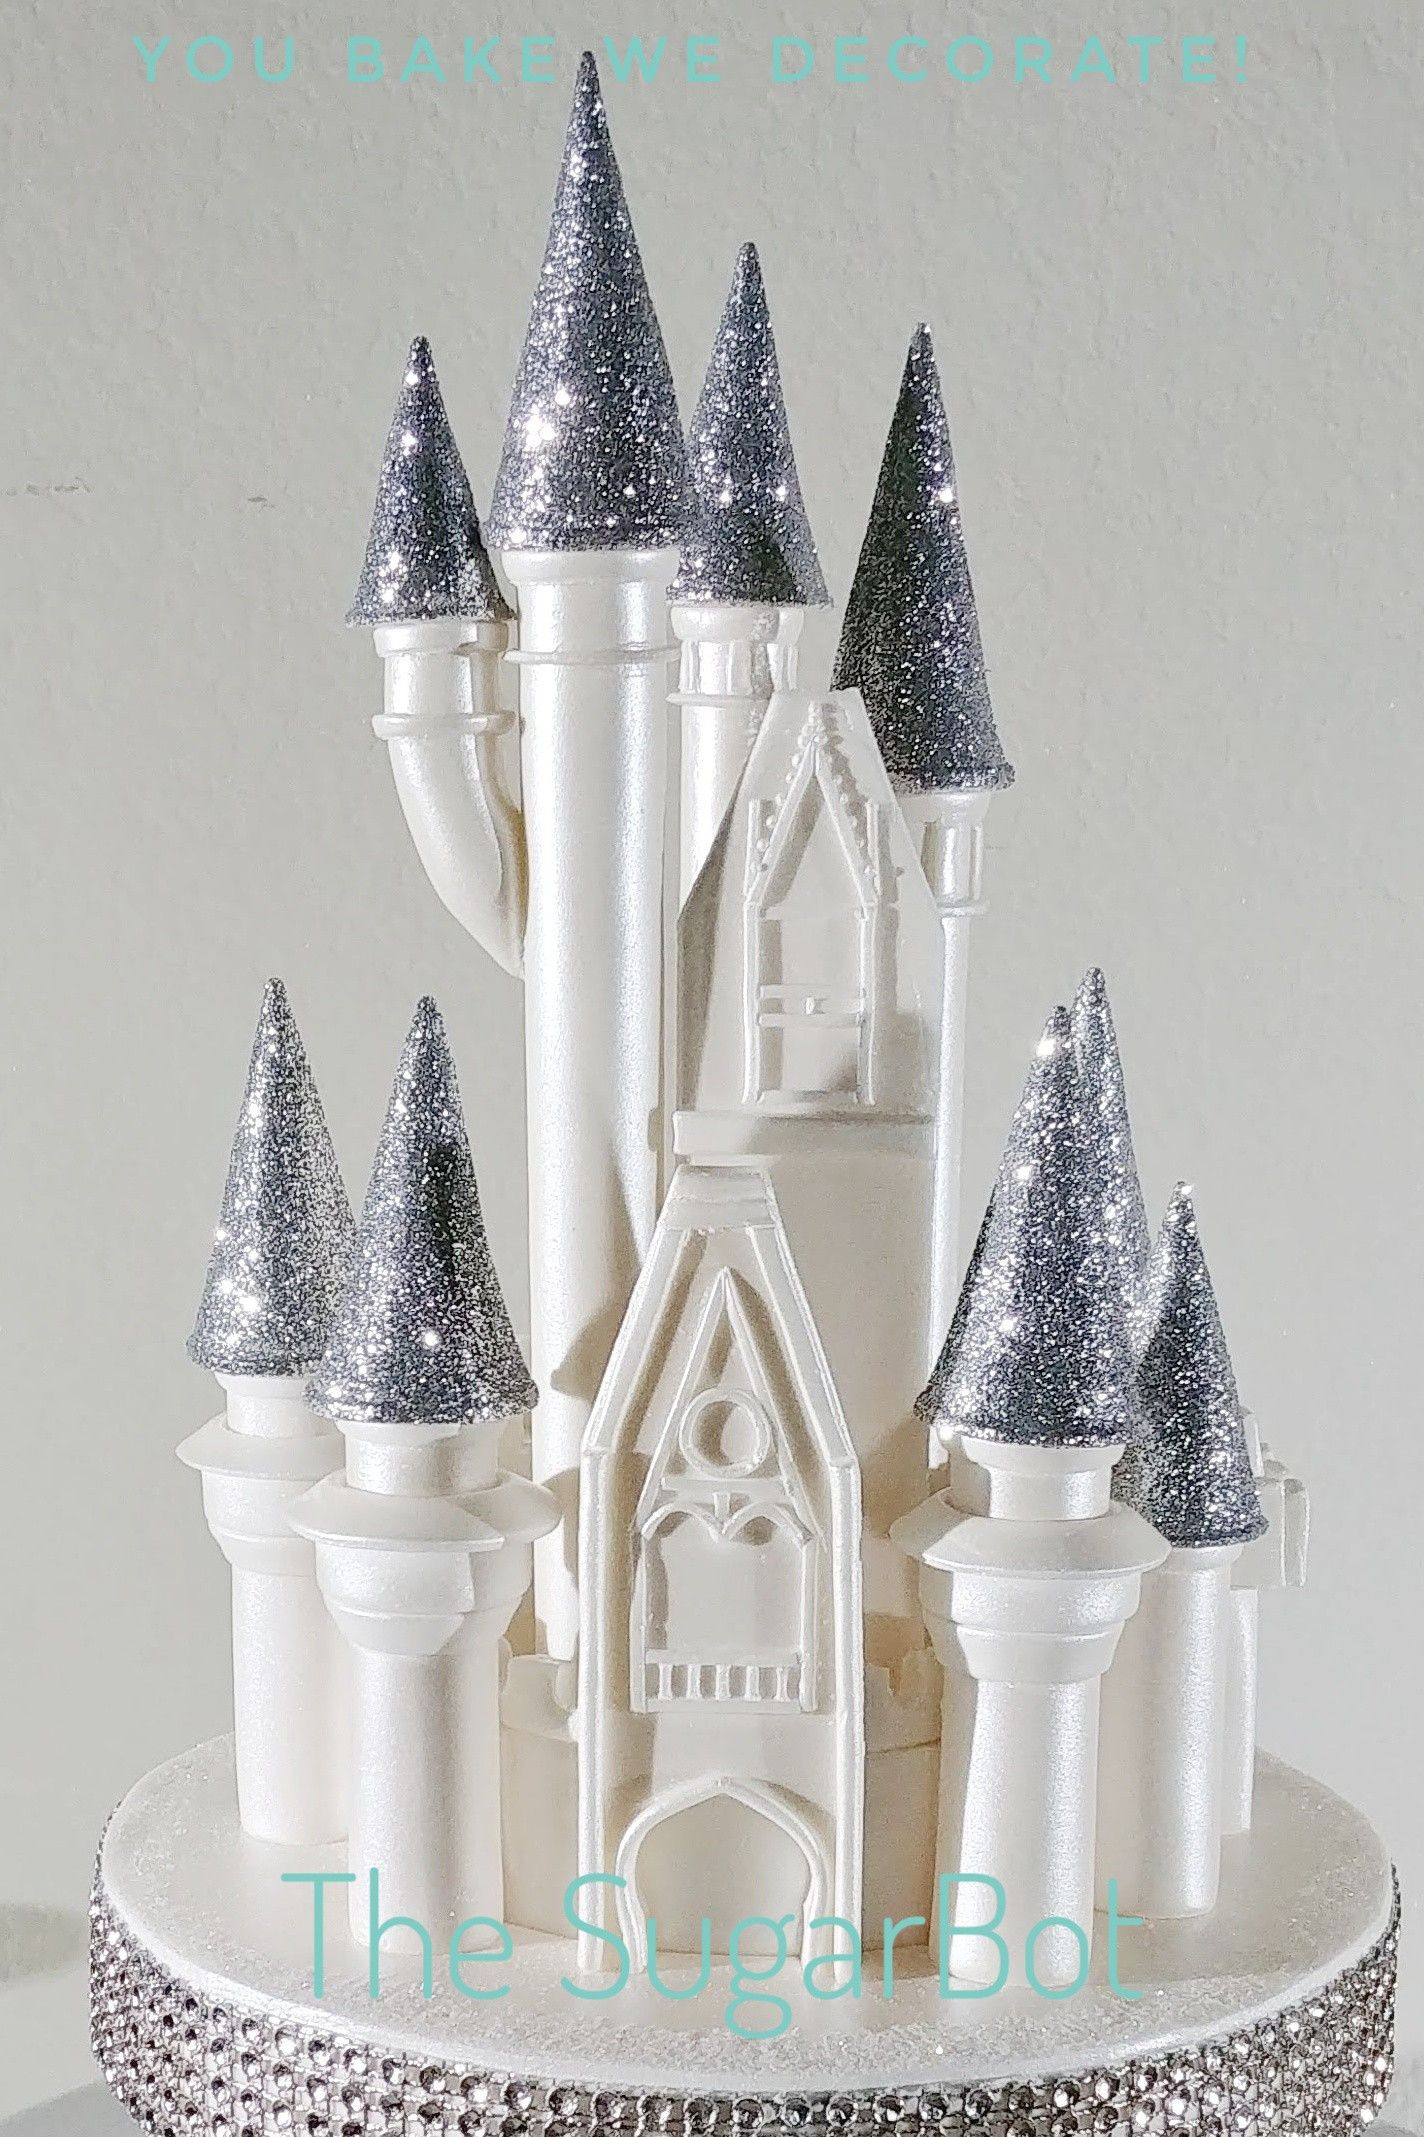 Disney cinderella castle cake topper handmade and shipped